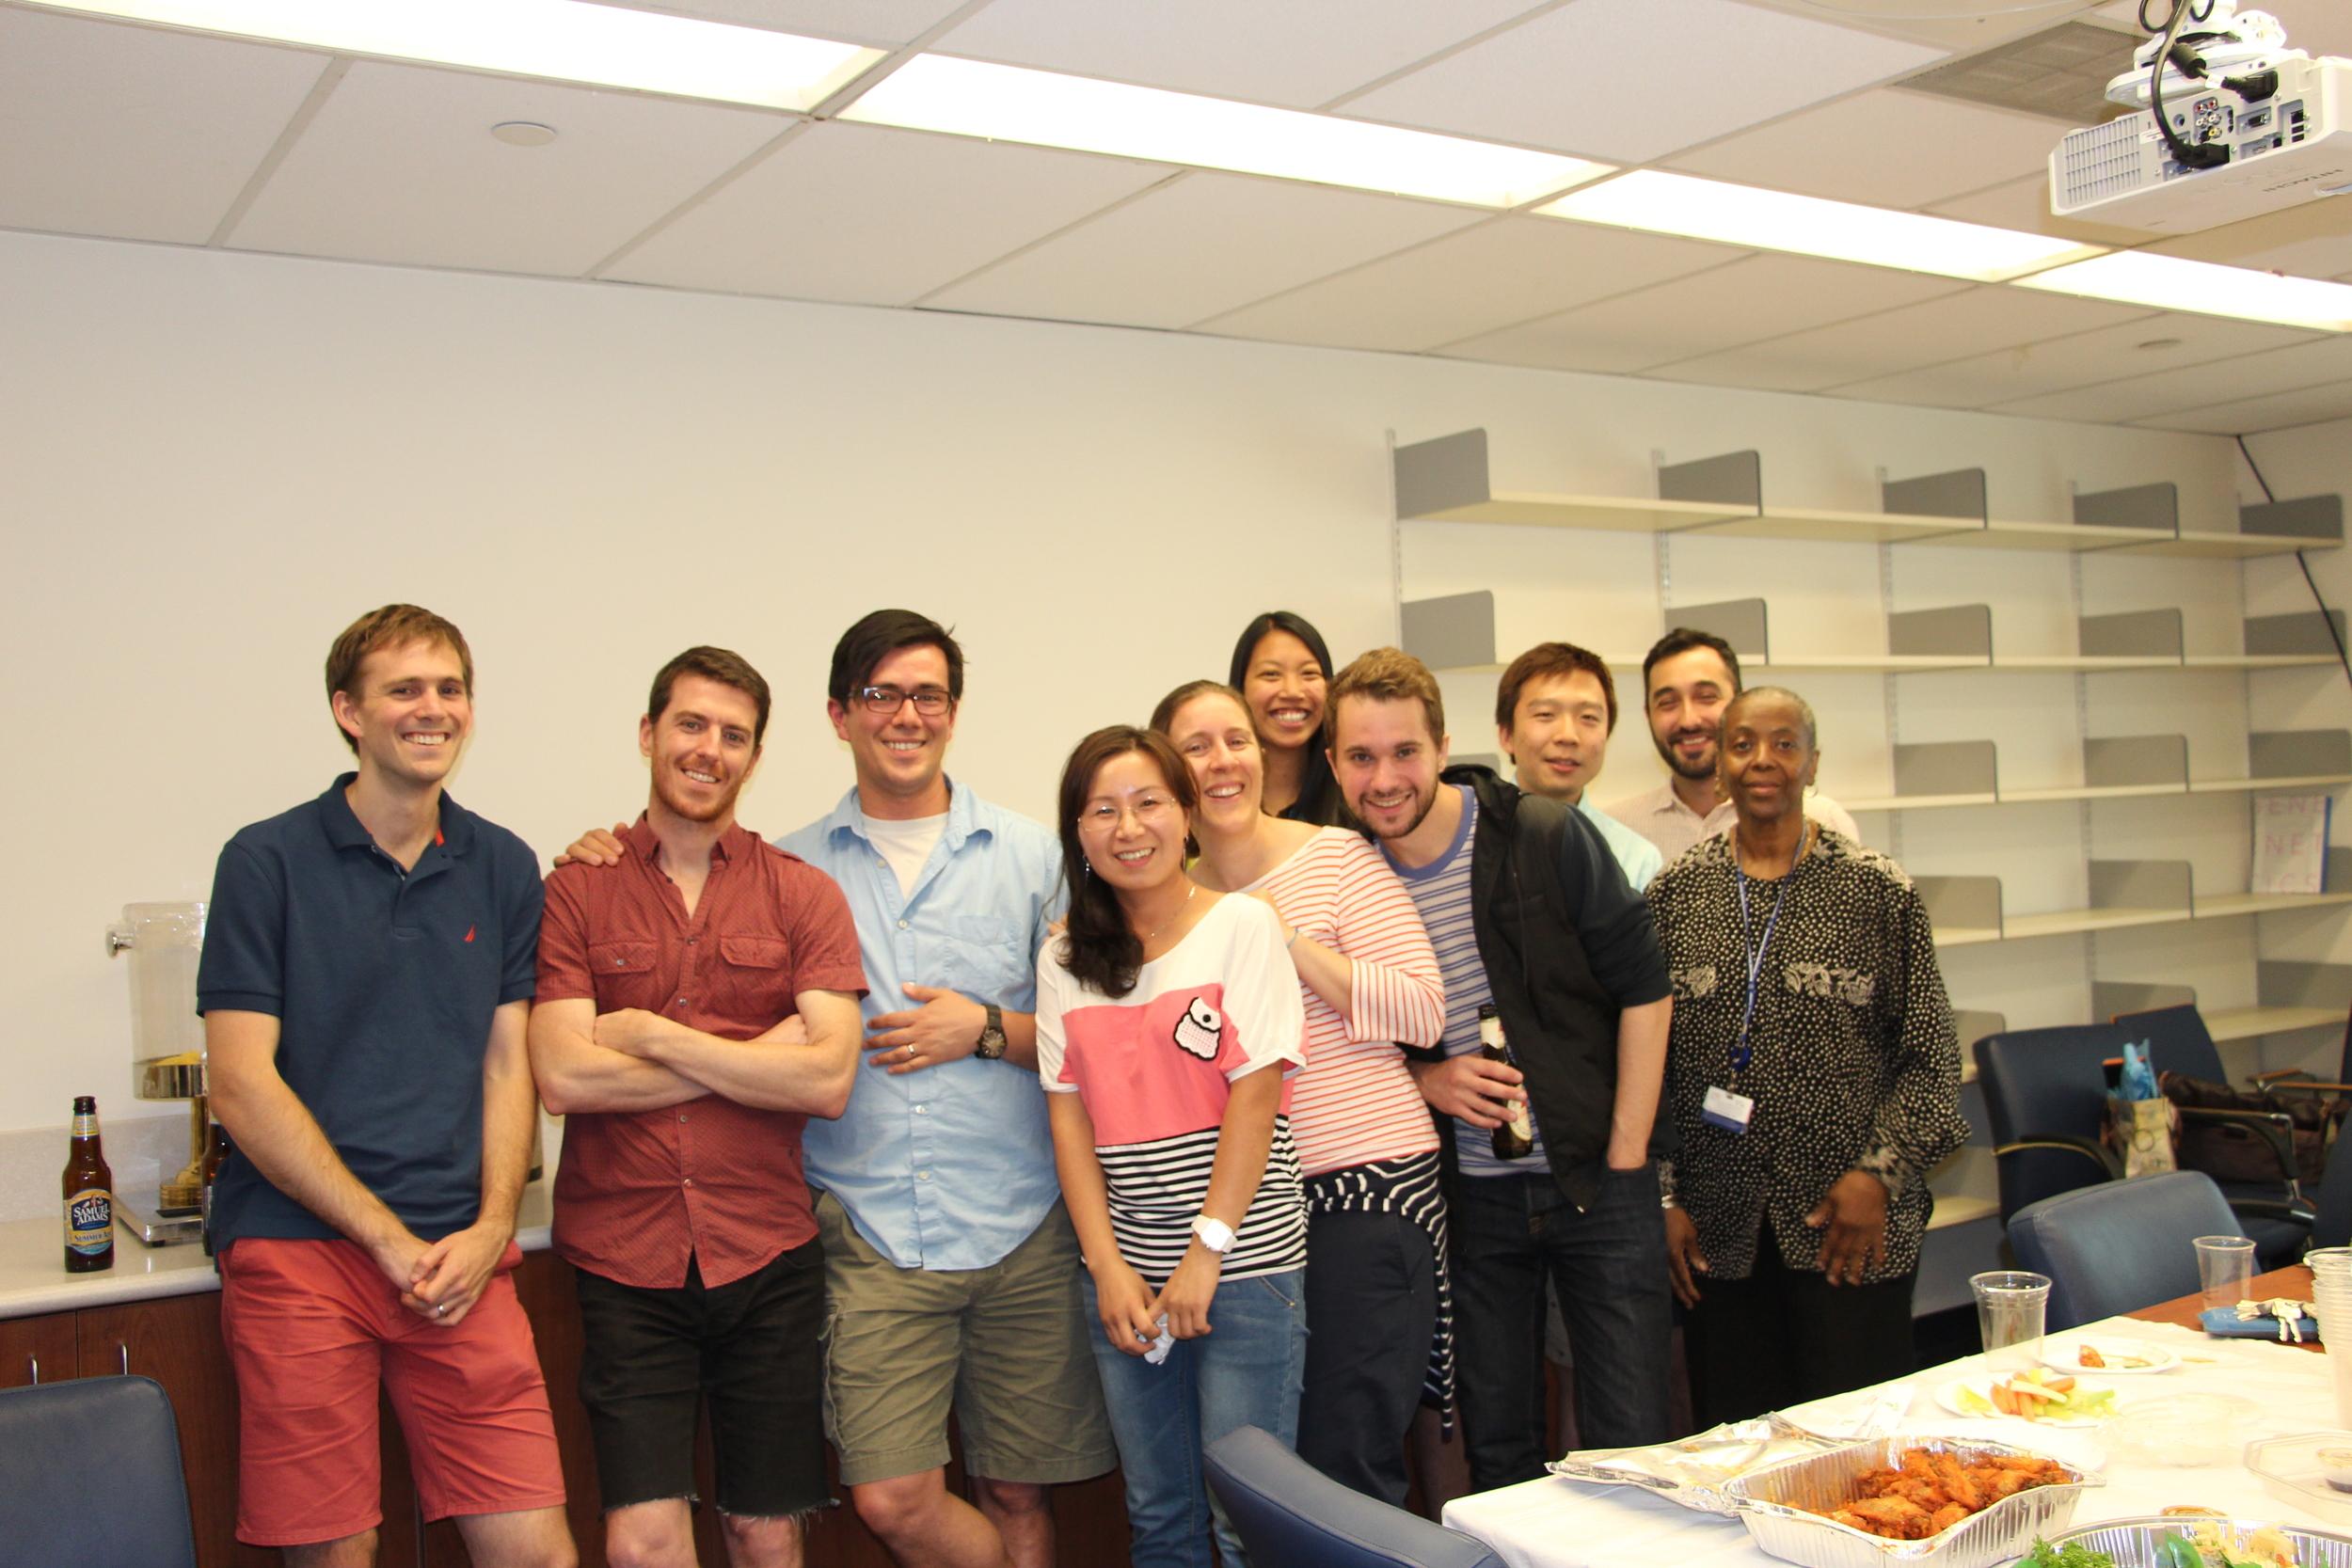 Good-bye Lai lab!